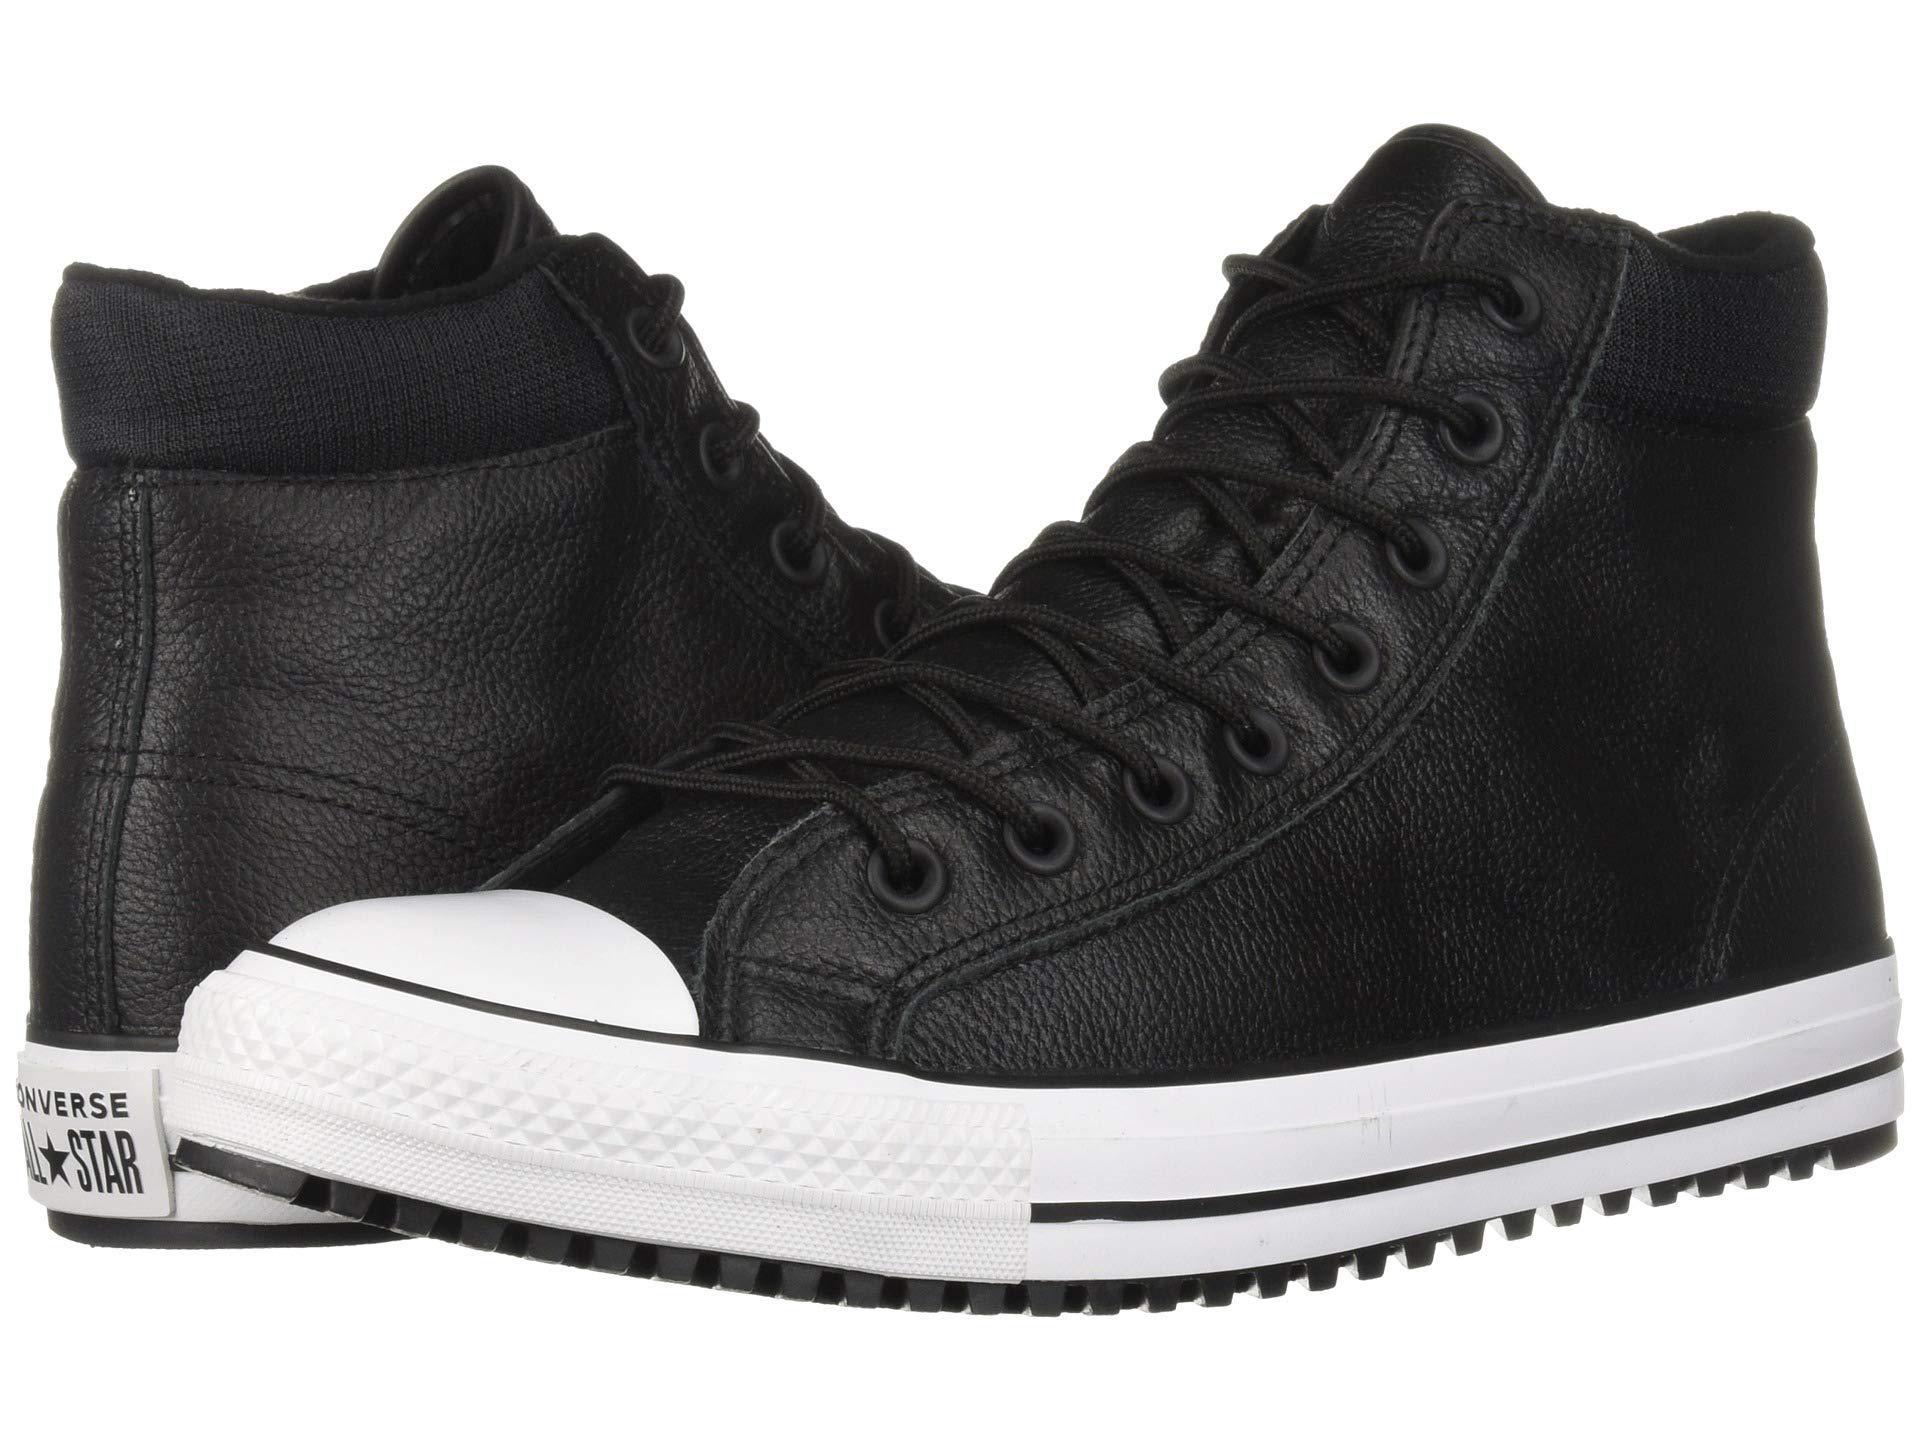 Lyst - Converse Chuck Taylor All Star Padded Collar Boot - Hi (black ... 016a4a7ec